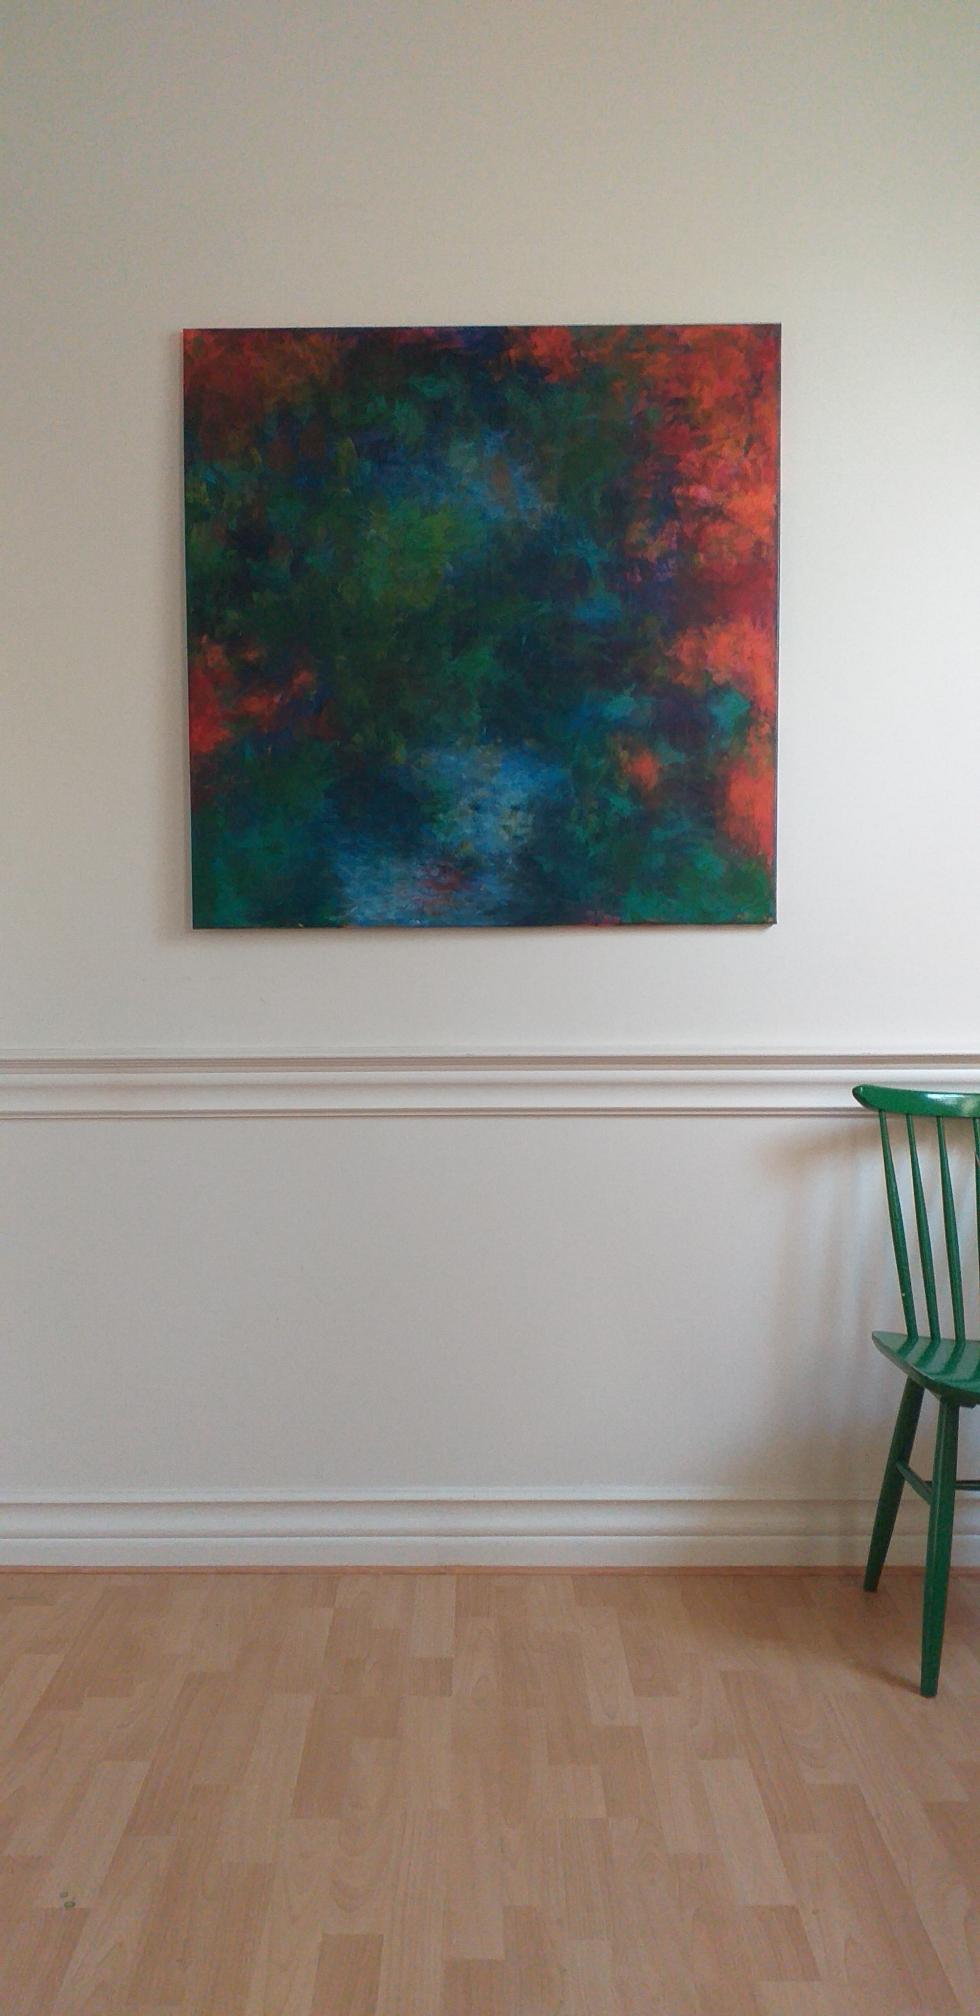 100x100cm acryl op canvas 2020 'Orange, blue and green